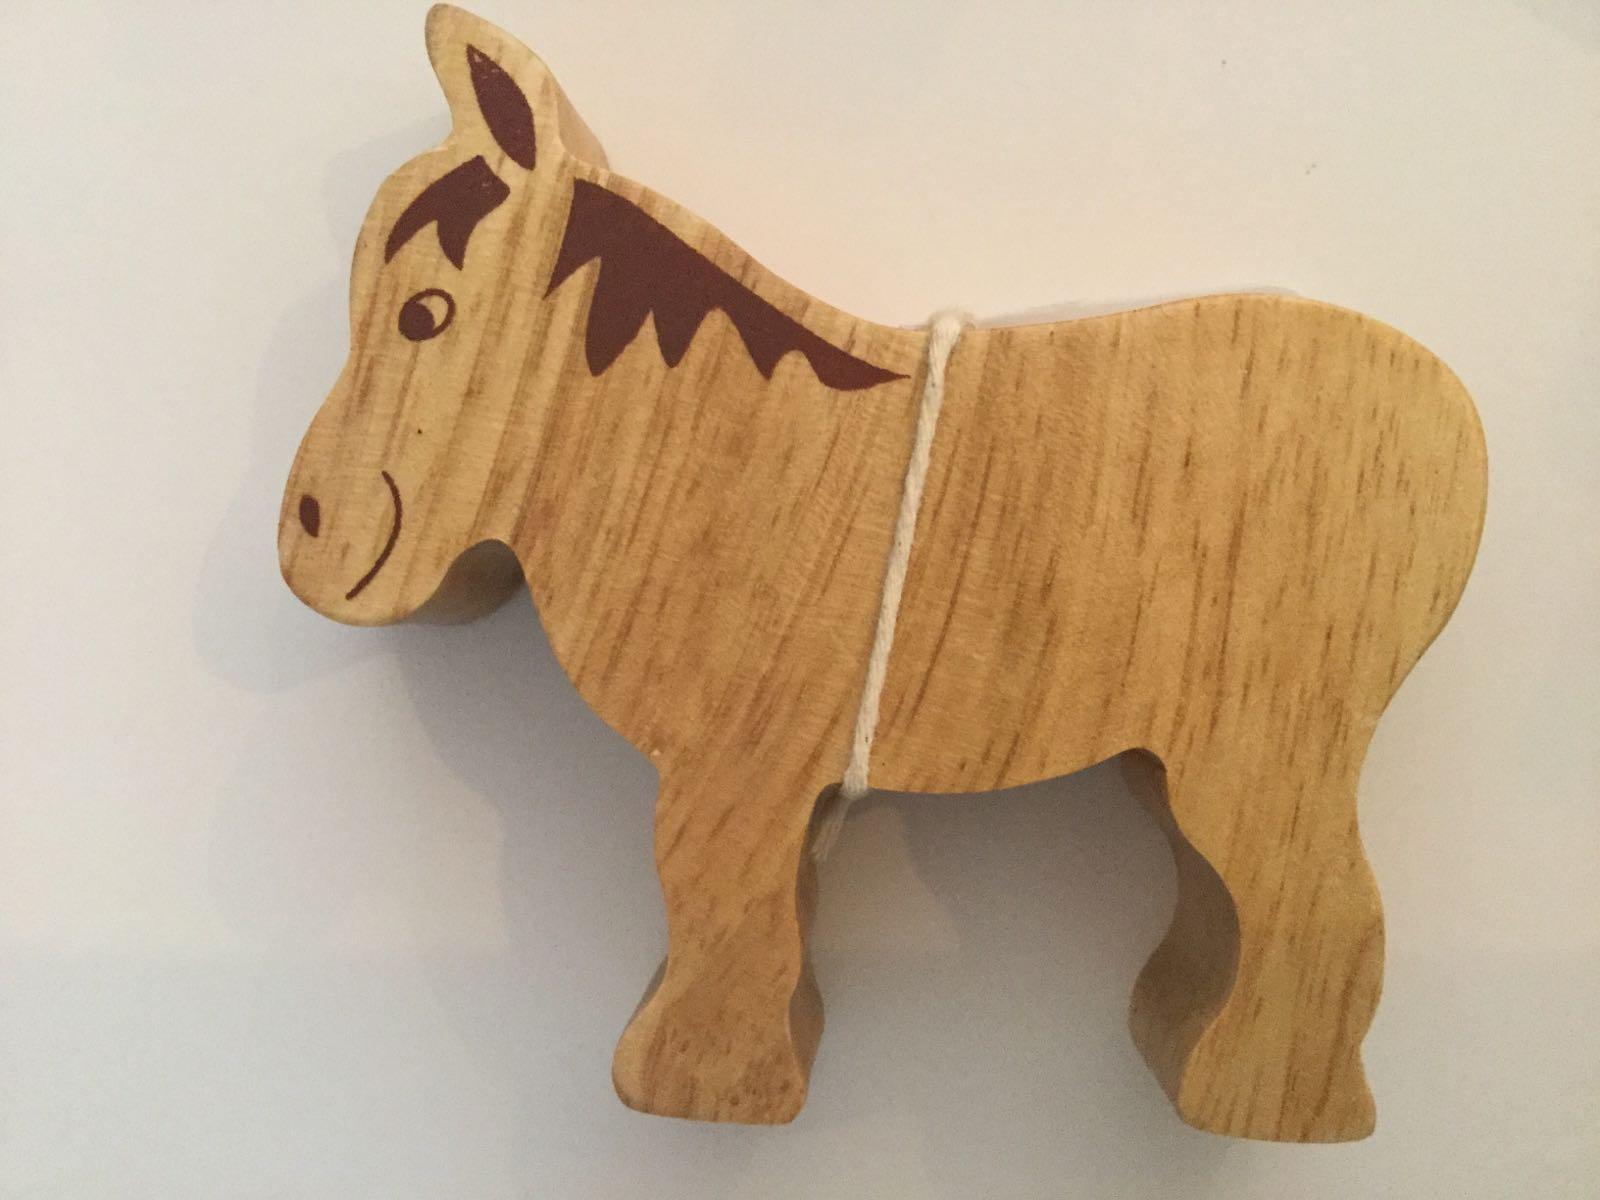 Lanka Kade - Natural - donkey